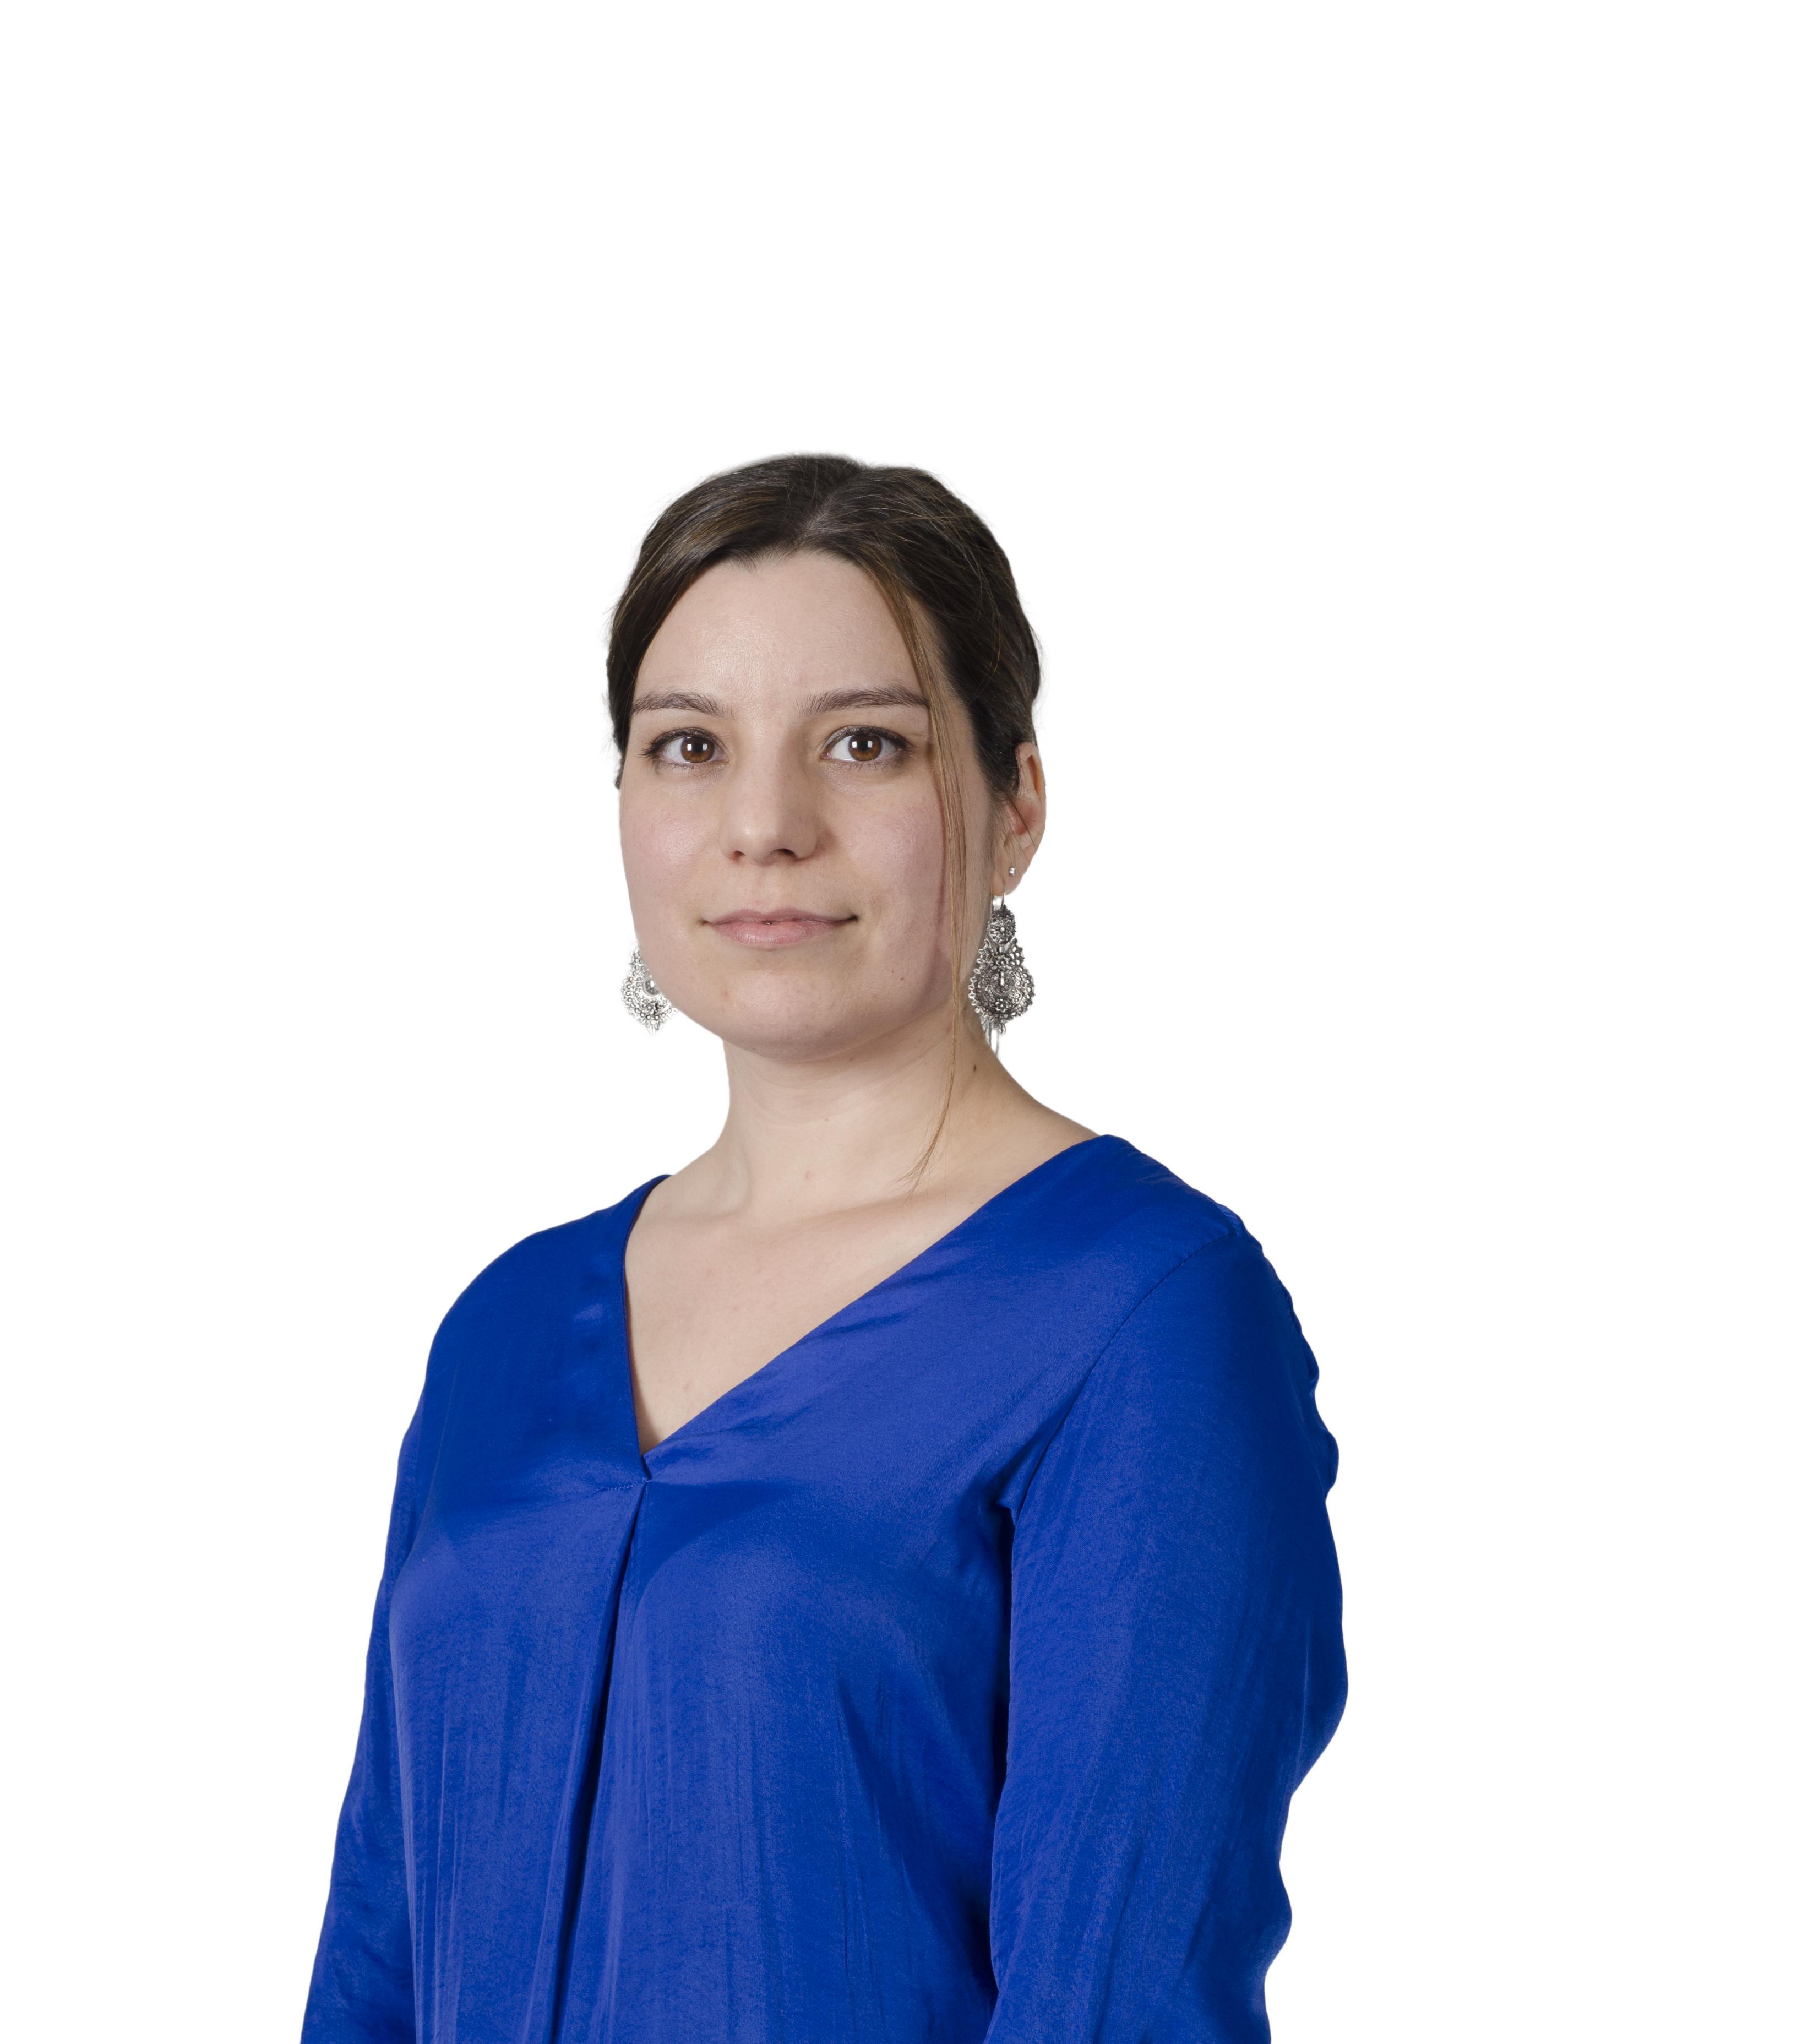 Marta Daniela Francisco Fernandes